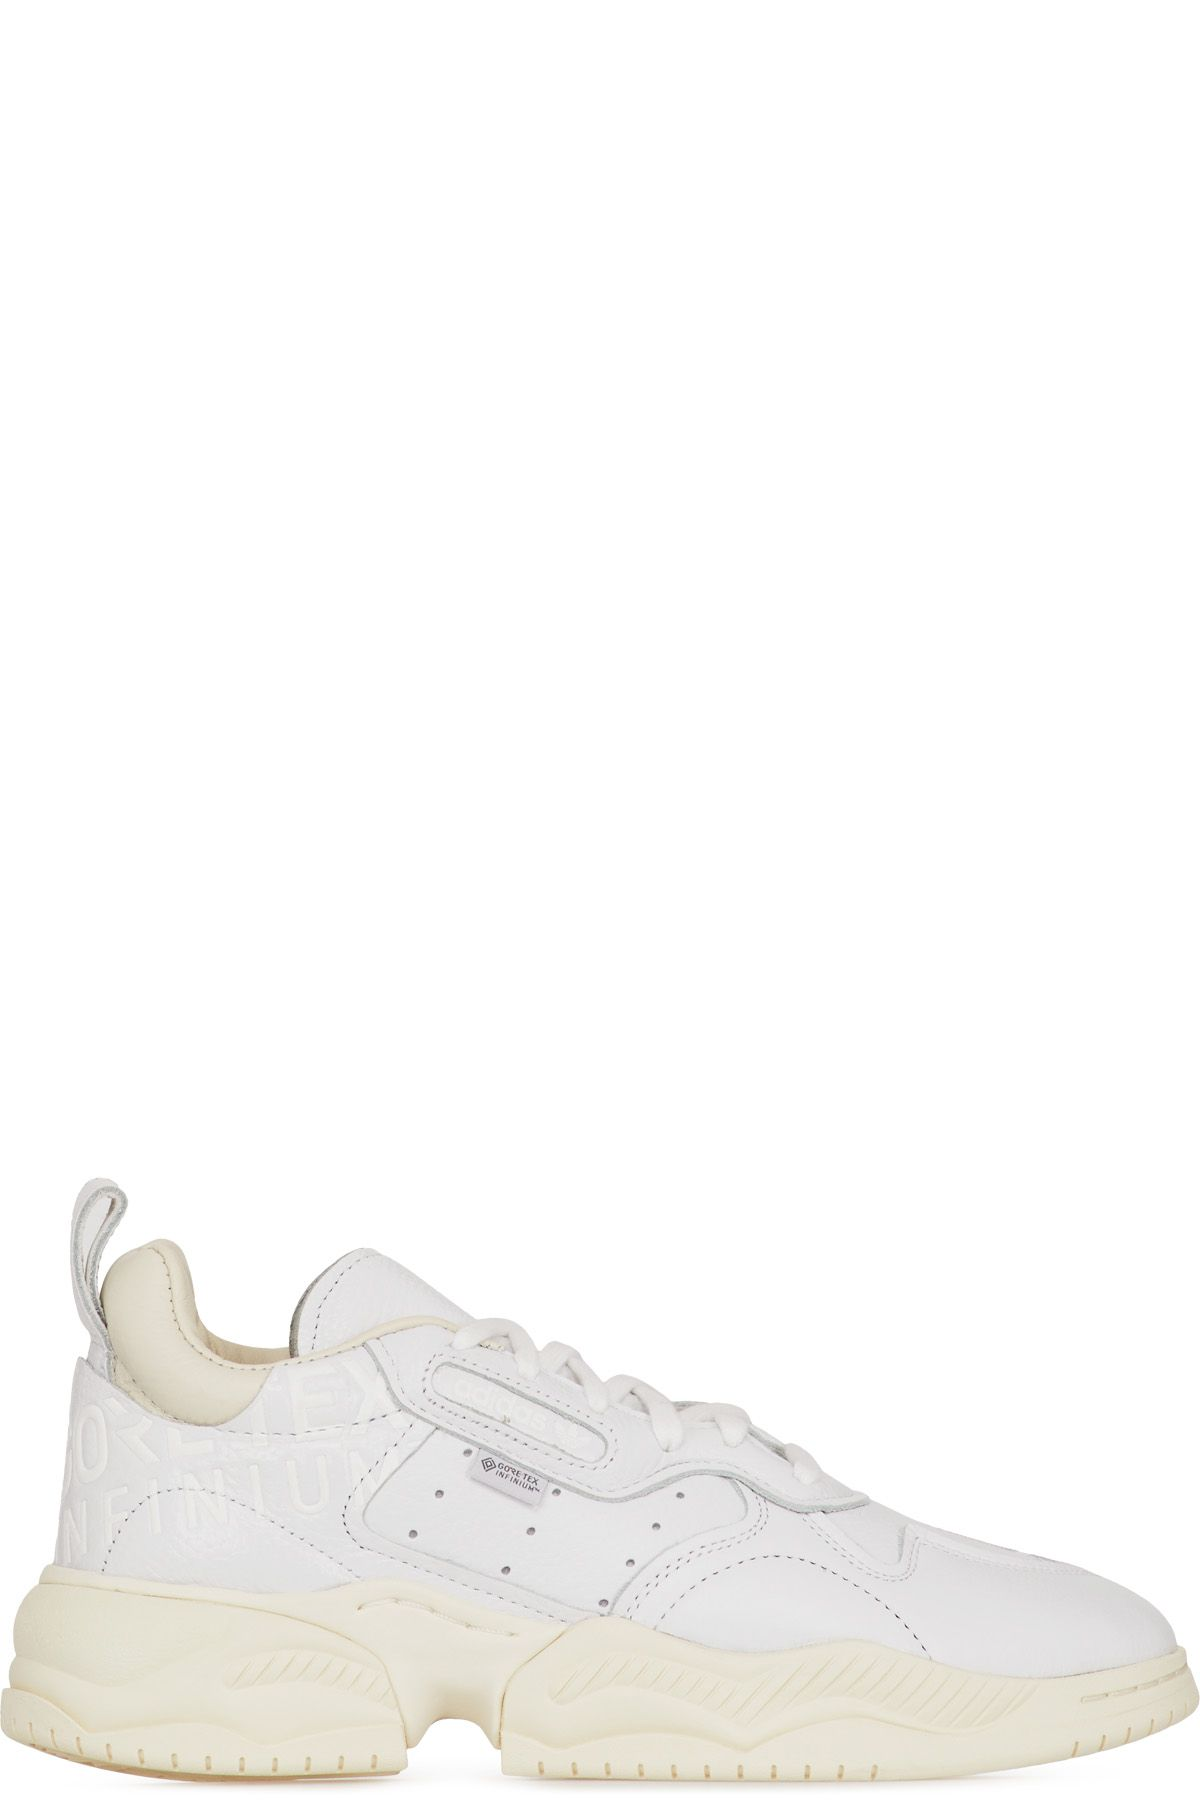 adidas Originals Supercourt RX Gore Tex Cloud WhiteOff